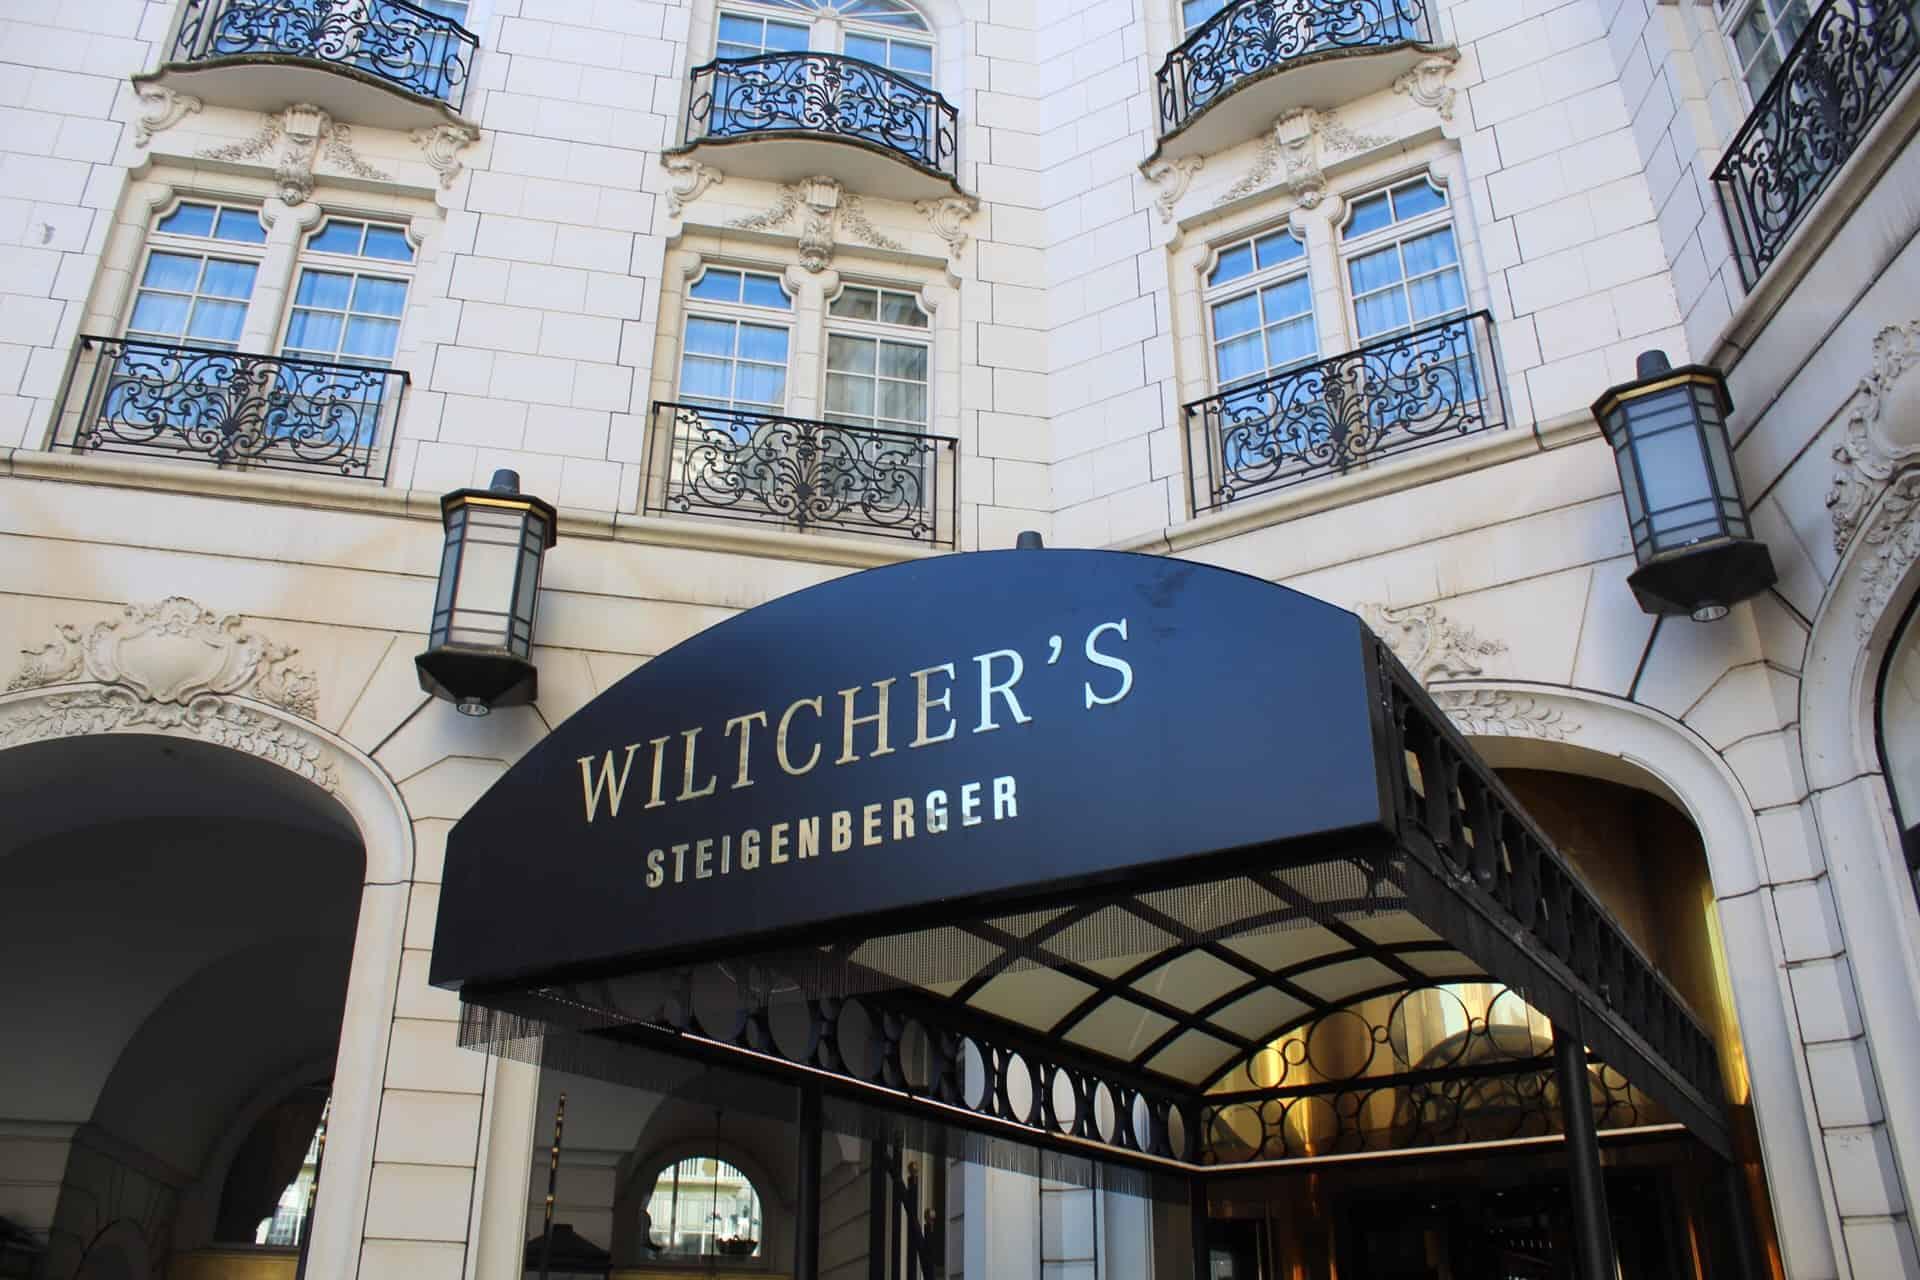 Frente do Steigenberger Wiltcher's em Bruxelas